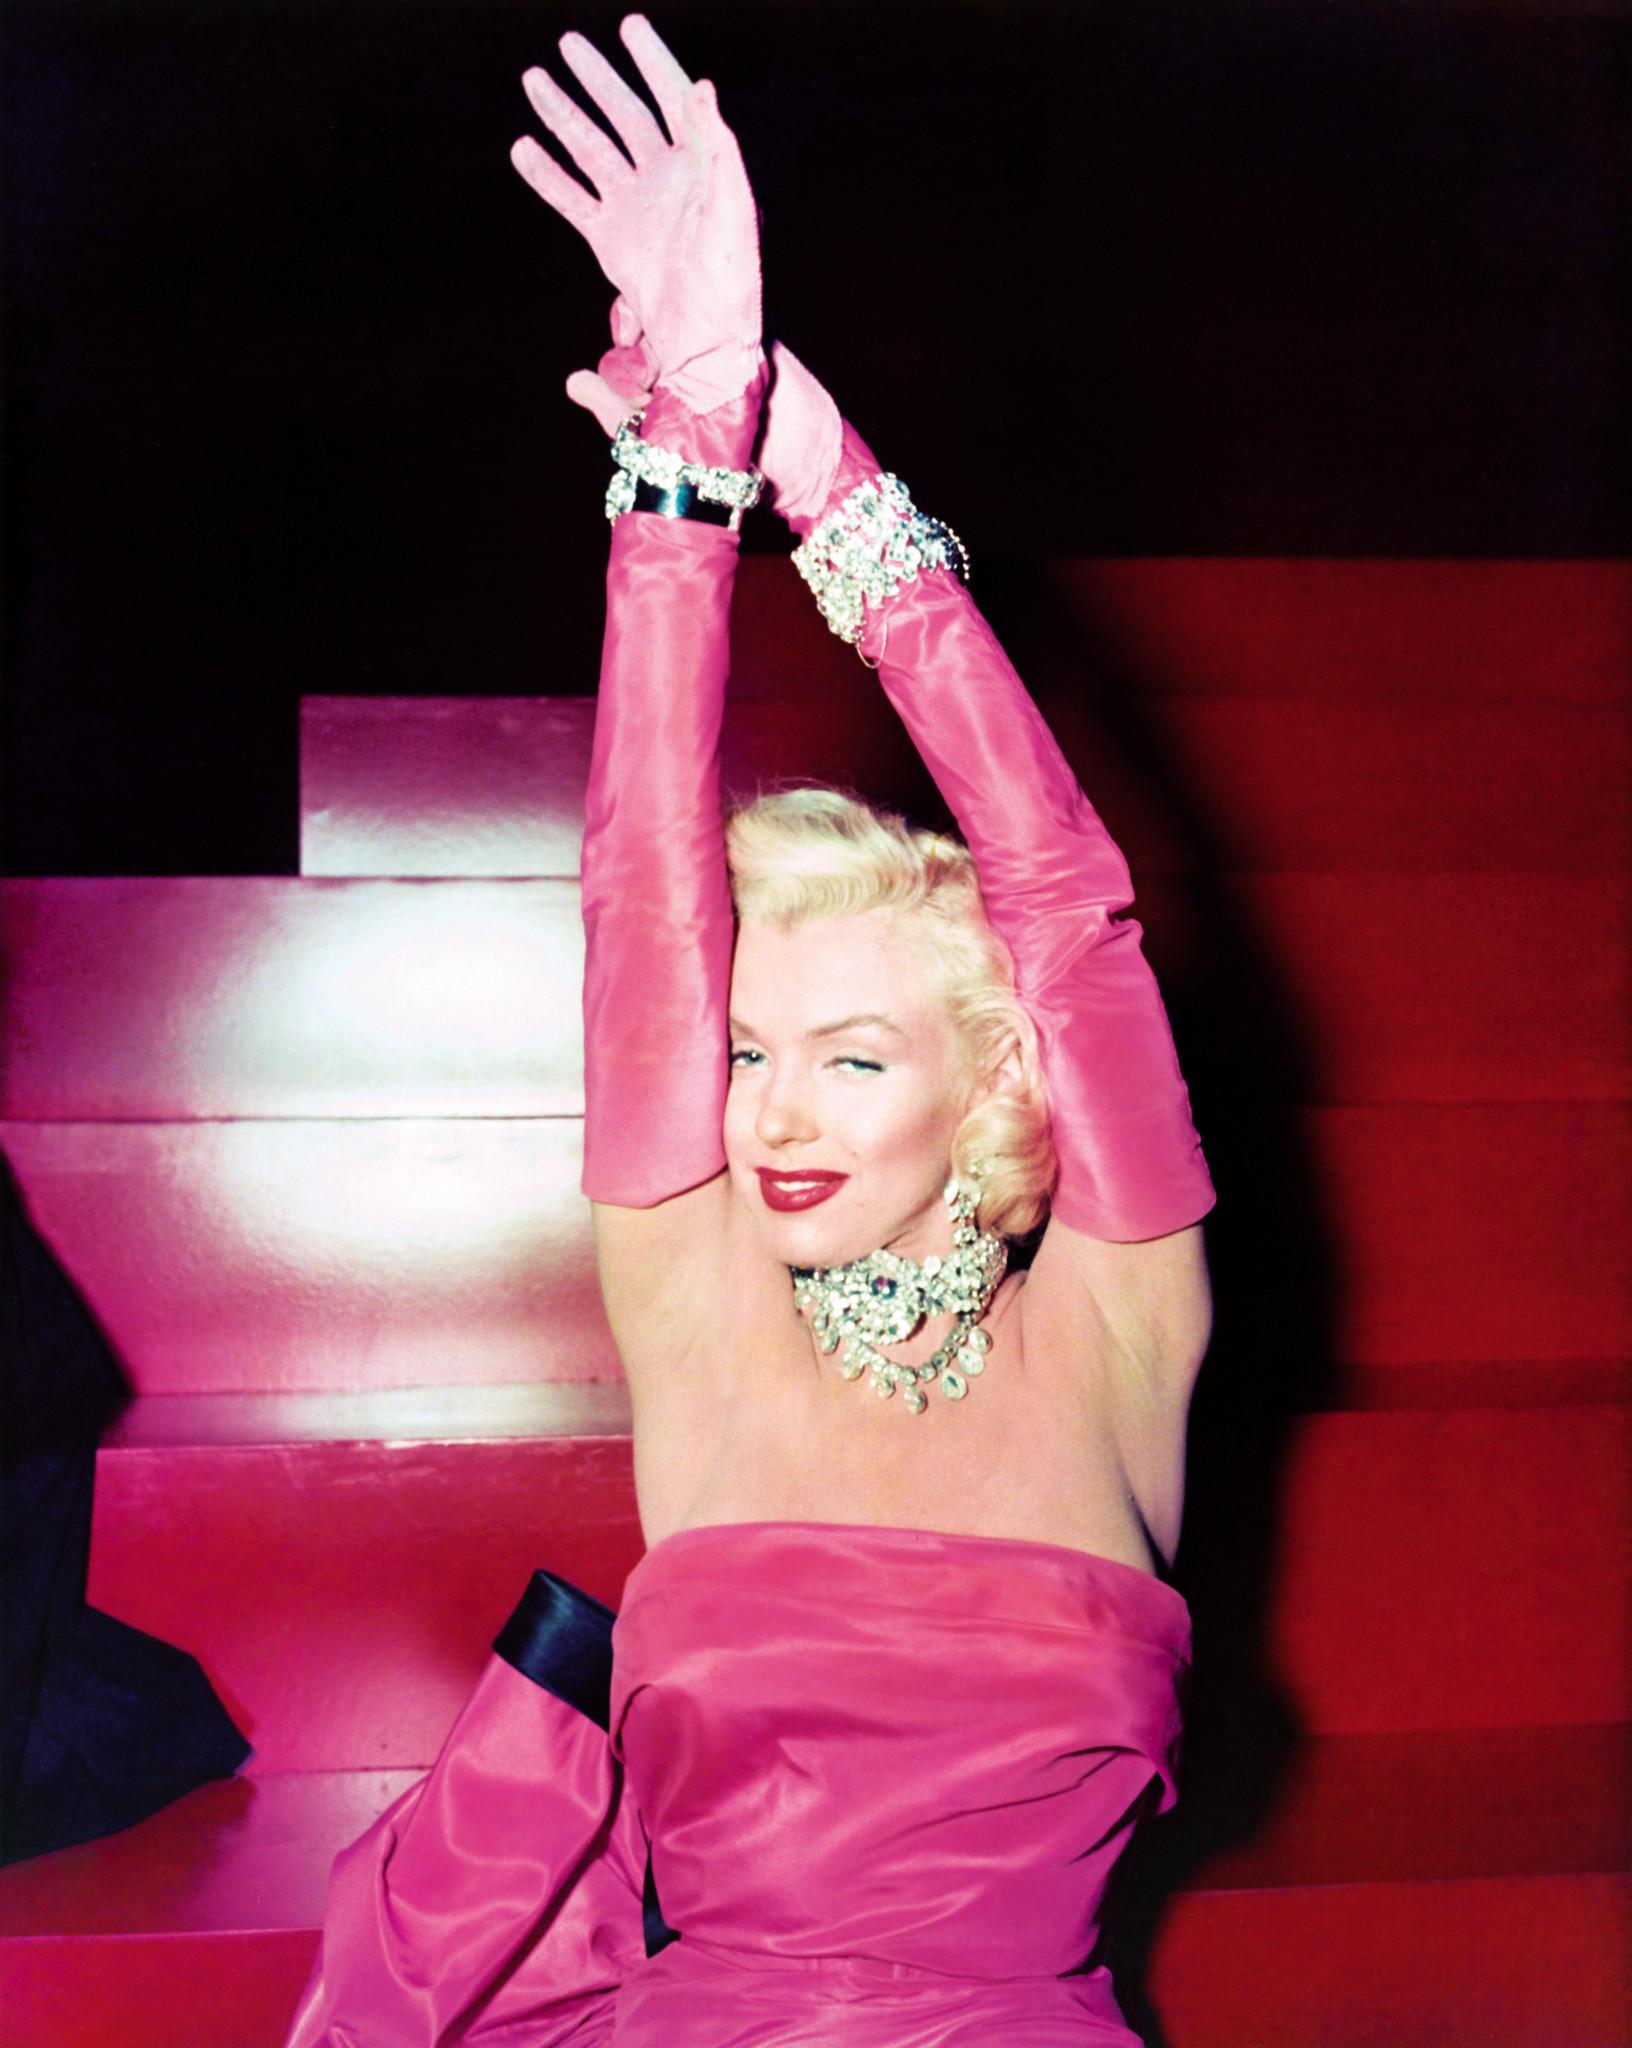 Marilyn Monroe On The Set Of 1953 Film Gentlemen Prefer Blondes Based